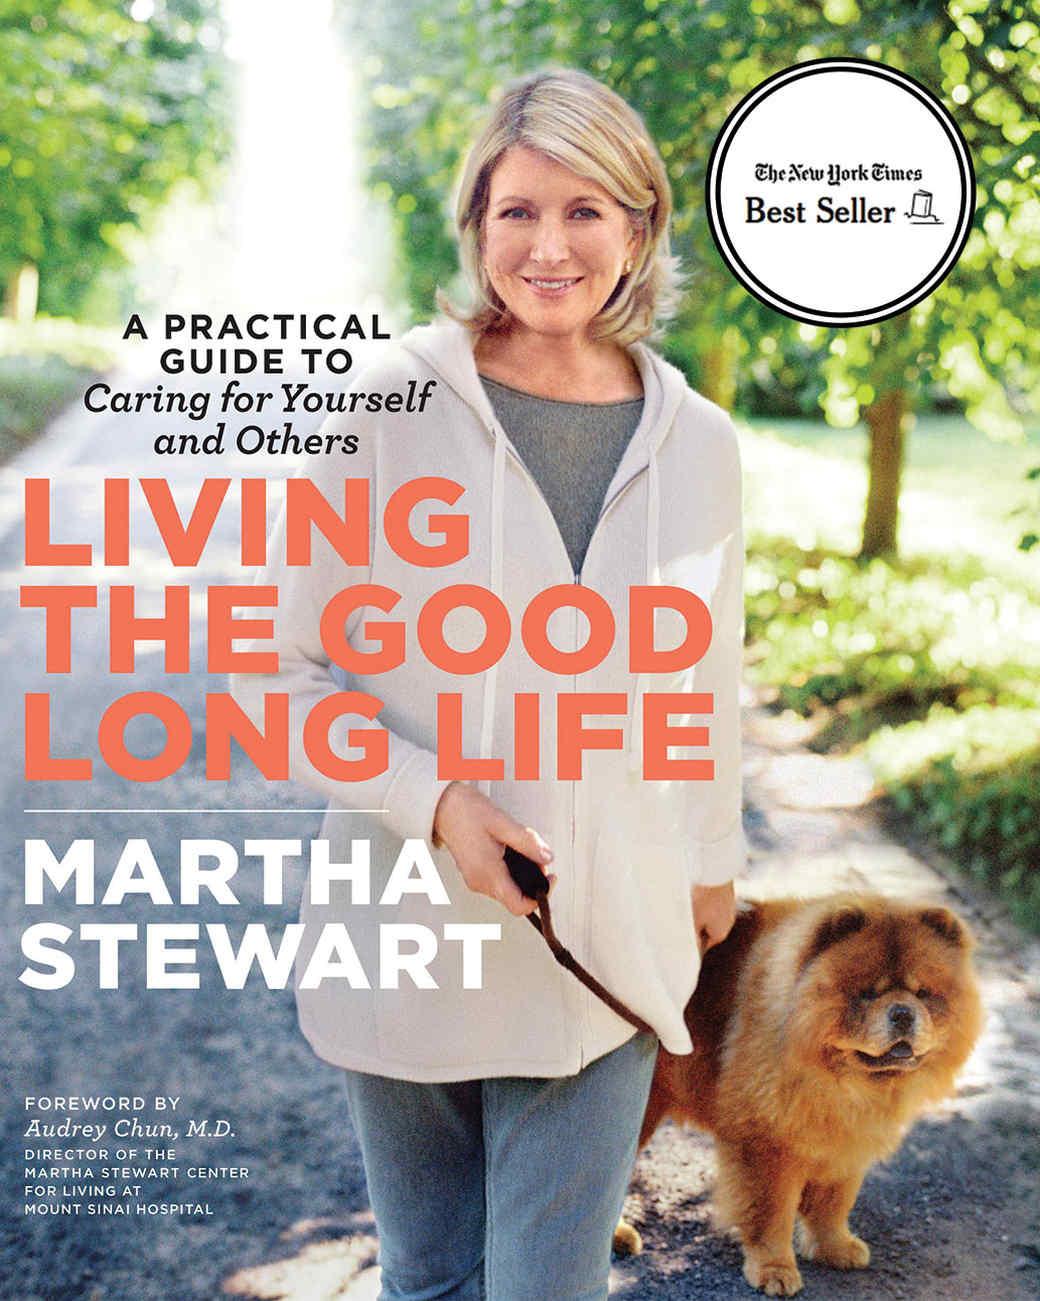 living-the-good-long-life-cover.jpg